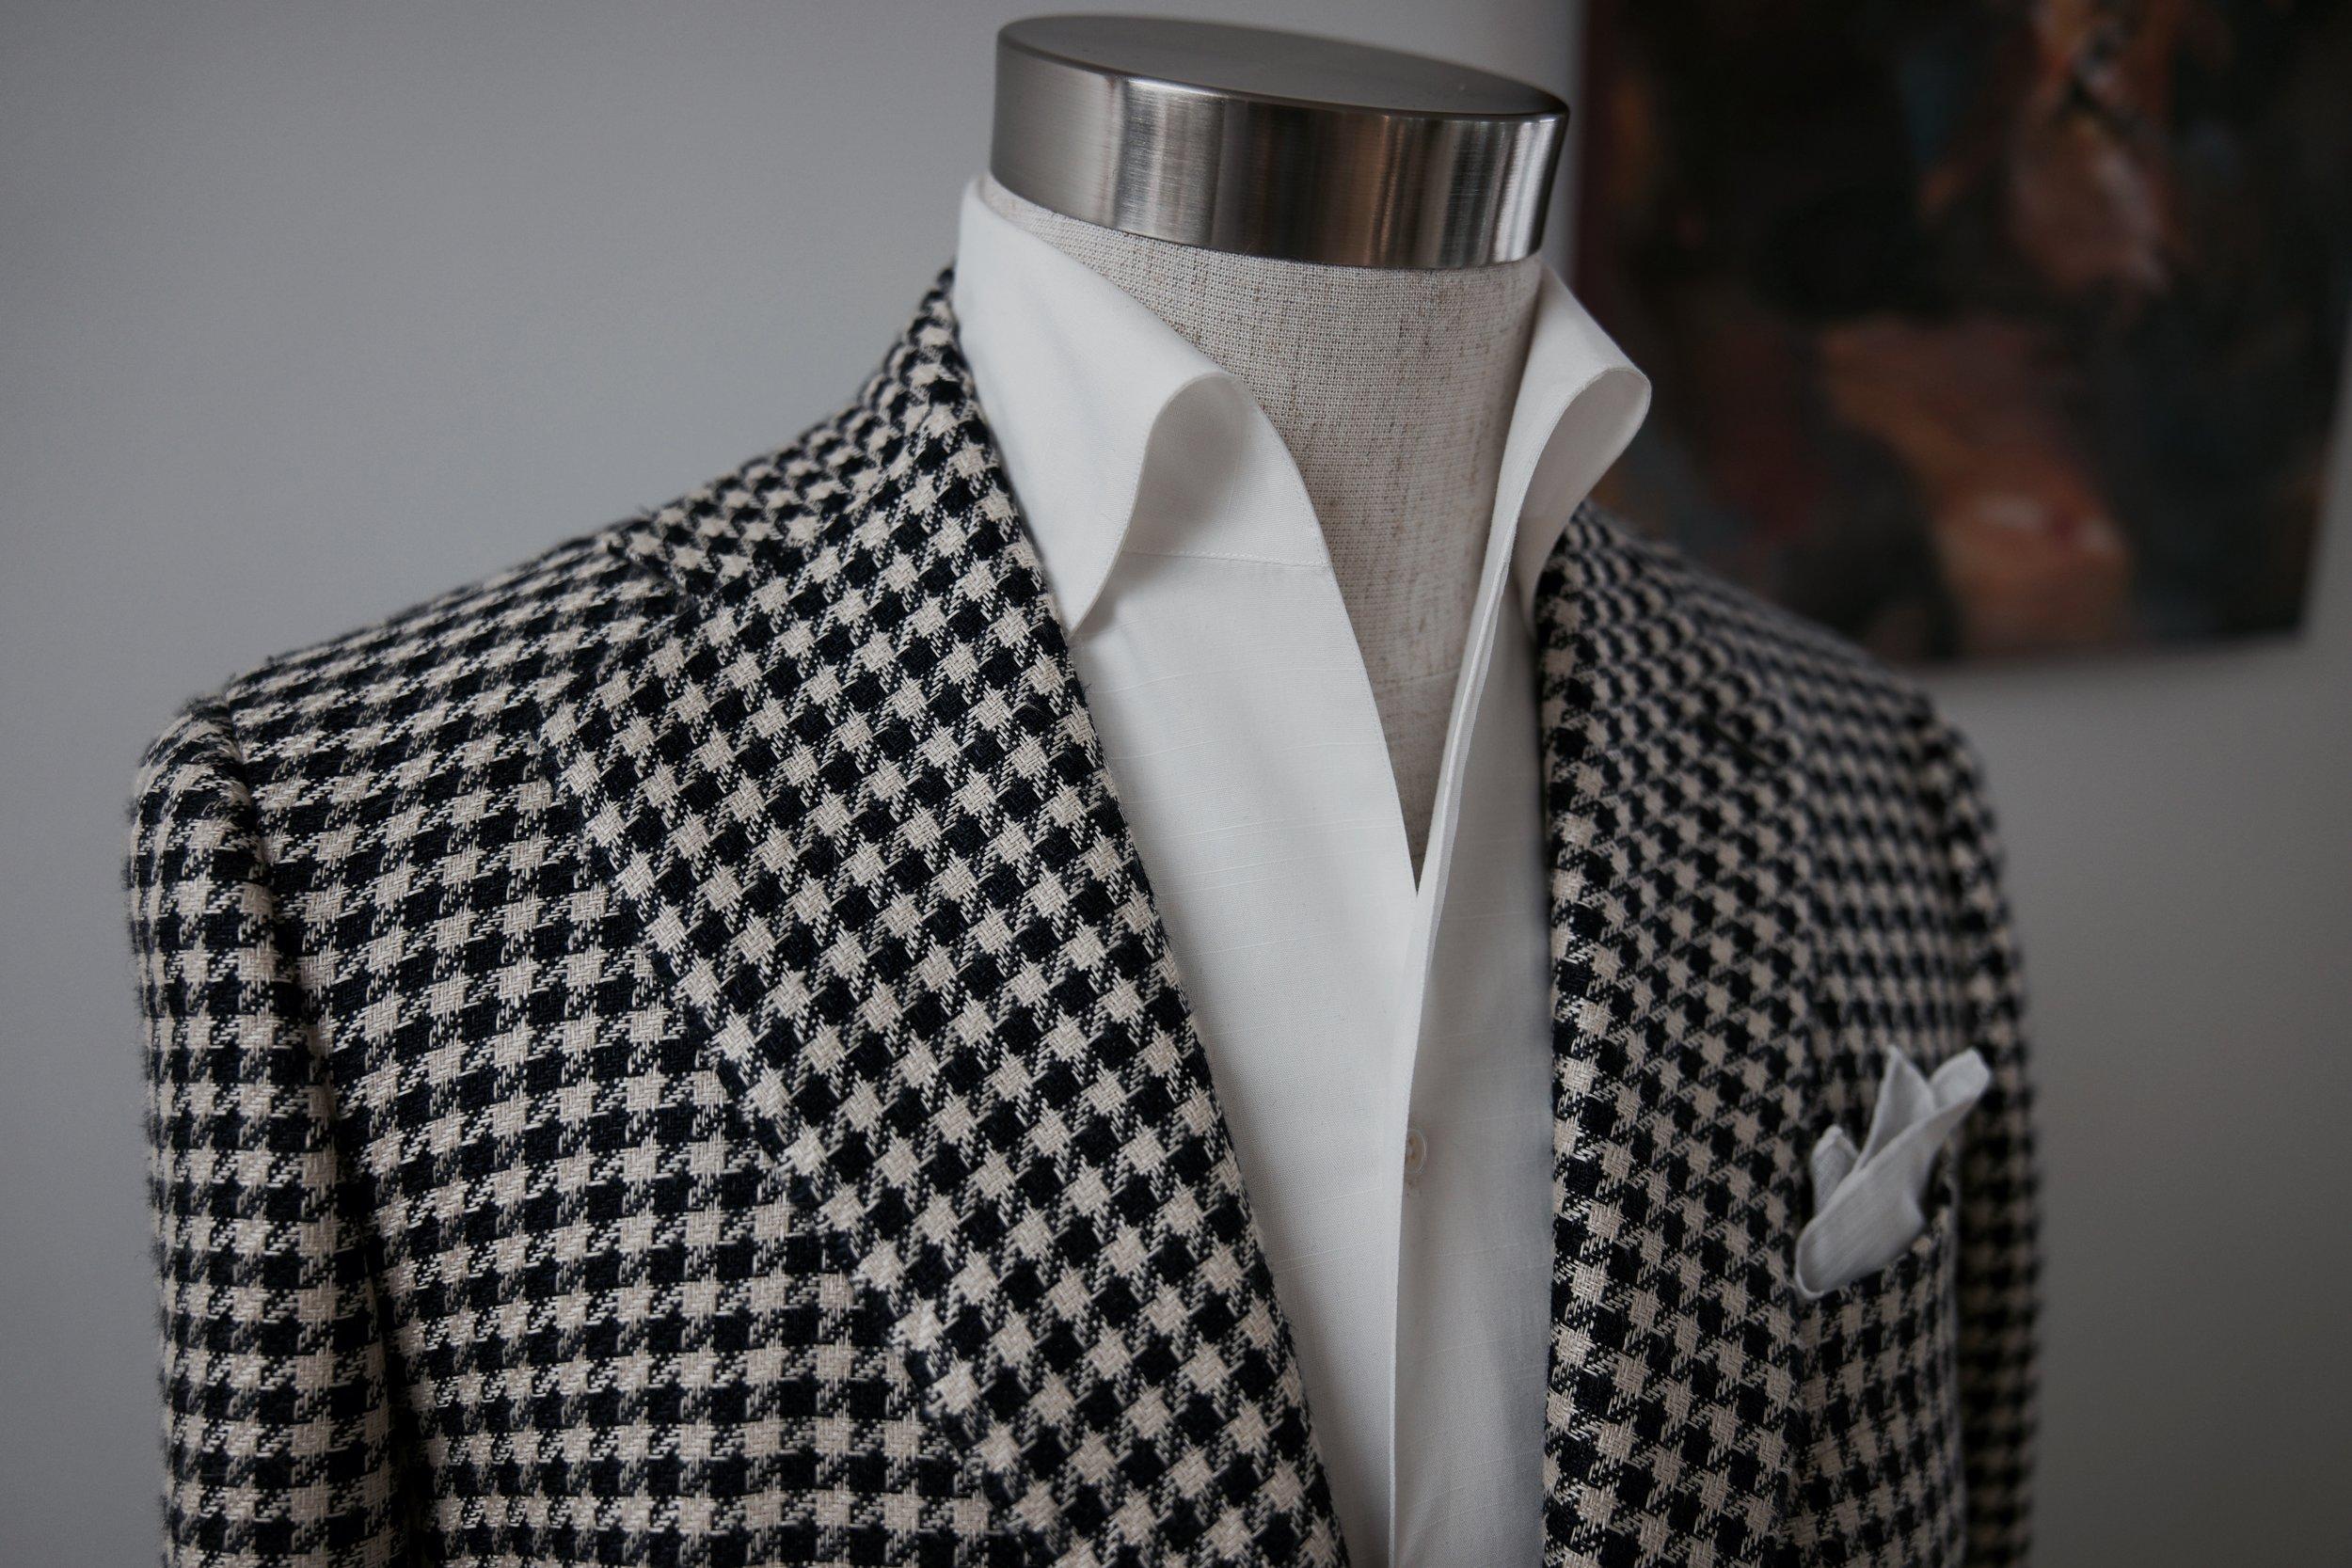 Magnus & Novus Hand Crafted Bespoke Tailoring